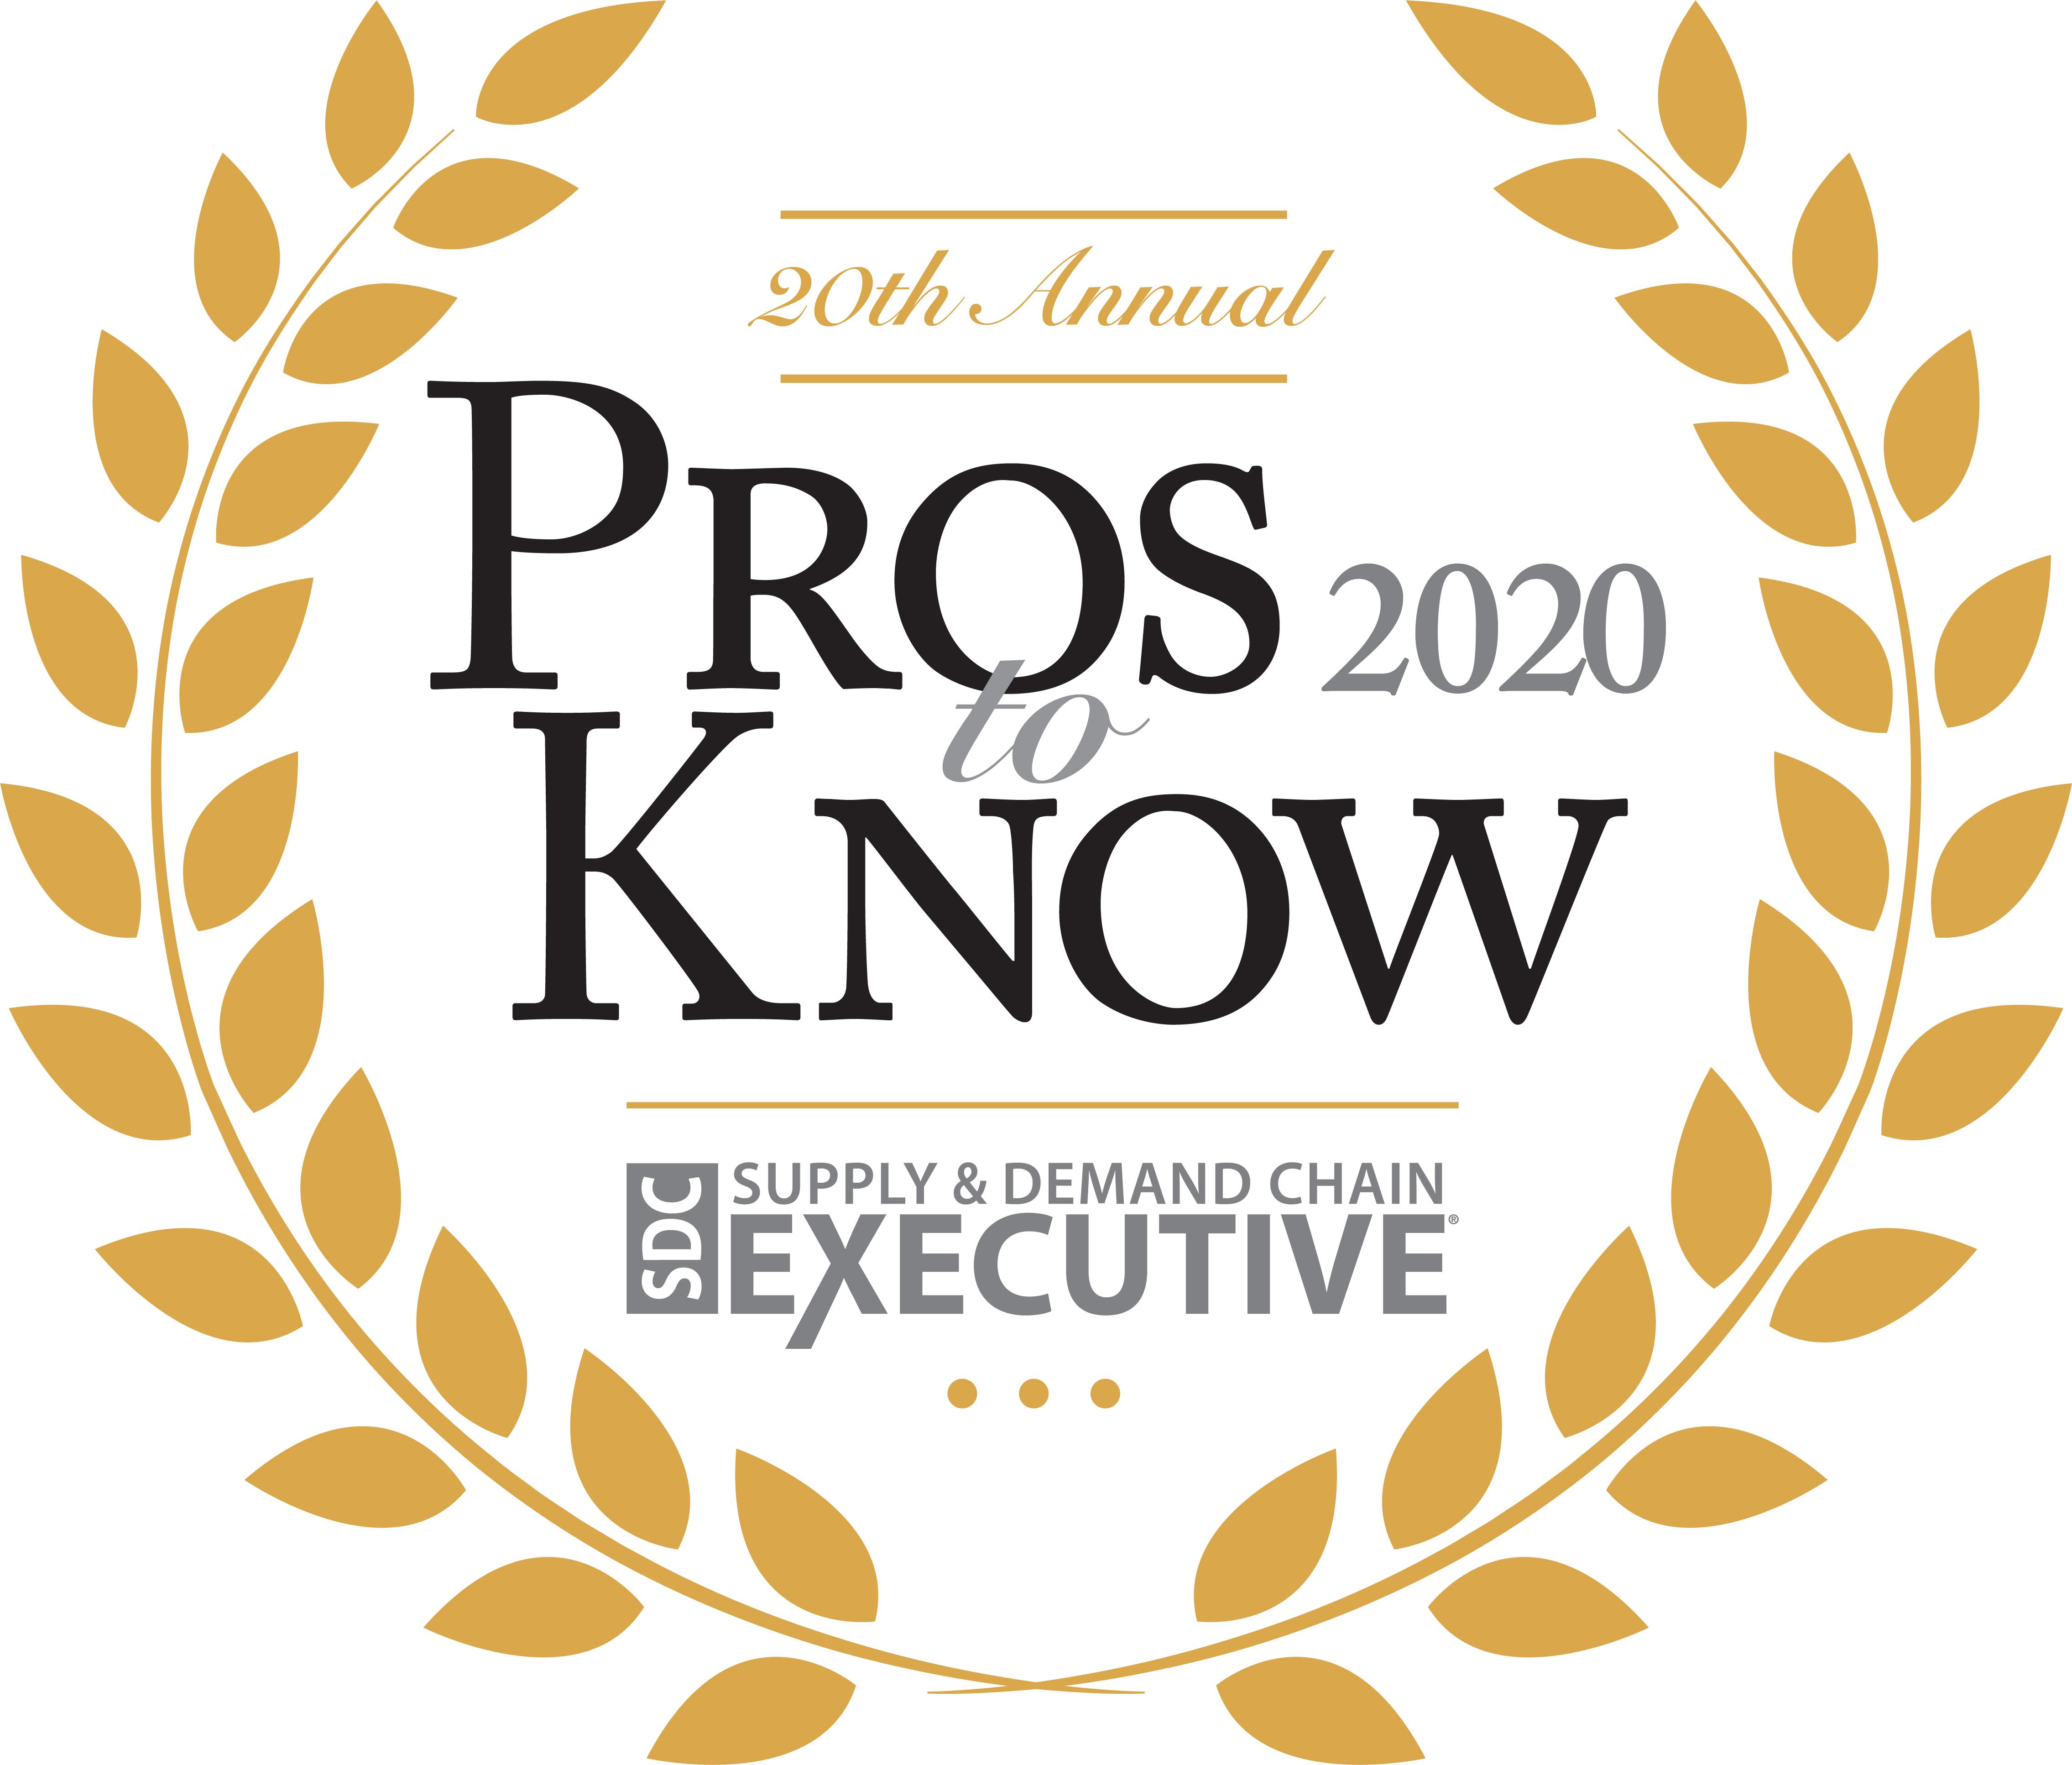 GPOs Help Procurement Achieve ROI Through Expertise. Pro to Know Winner